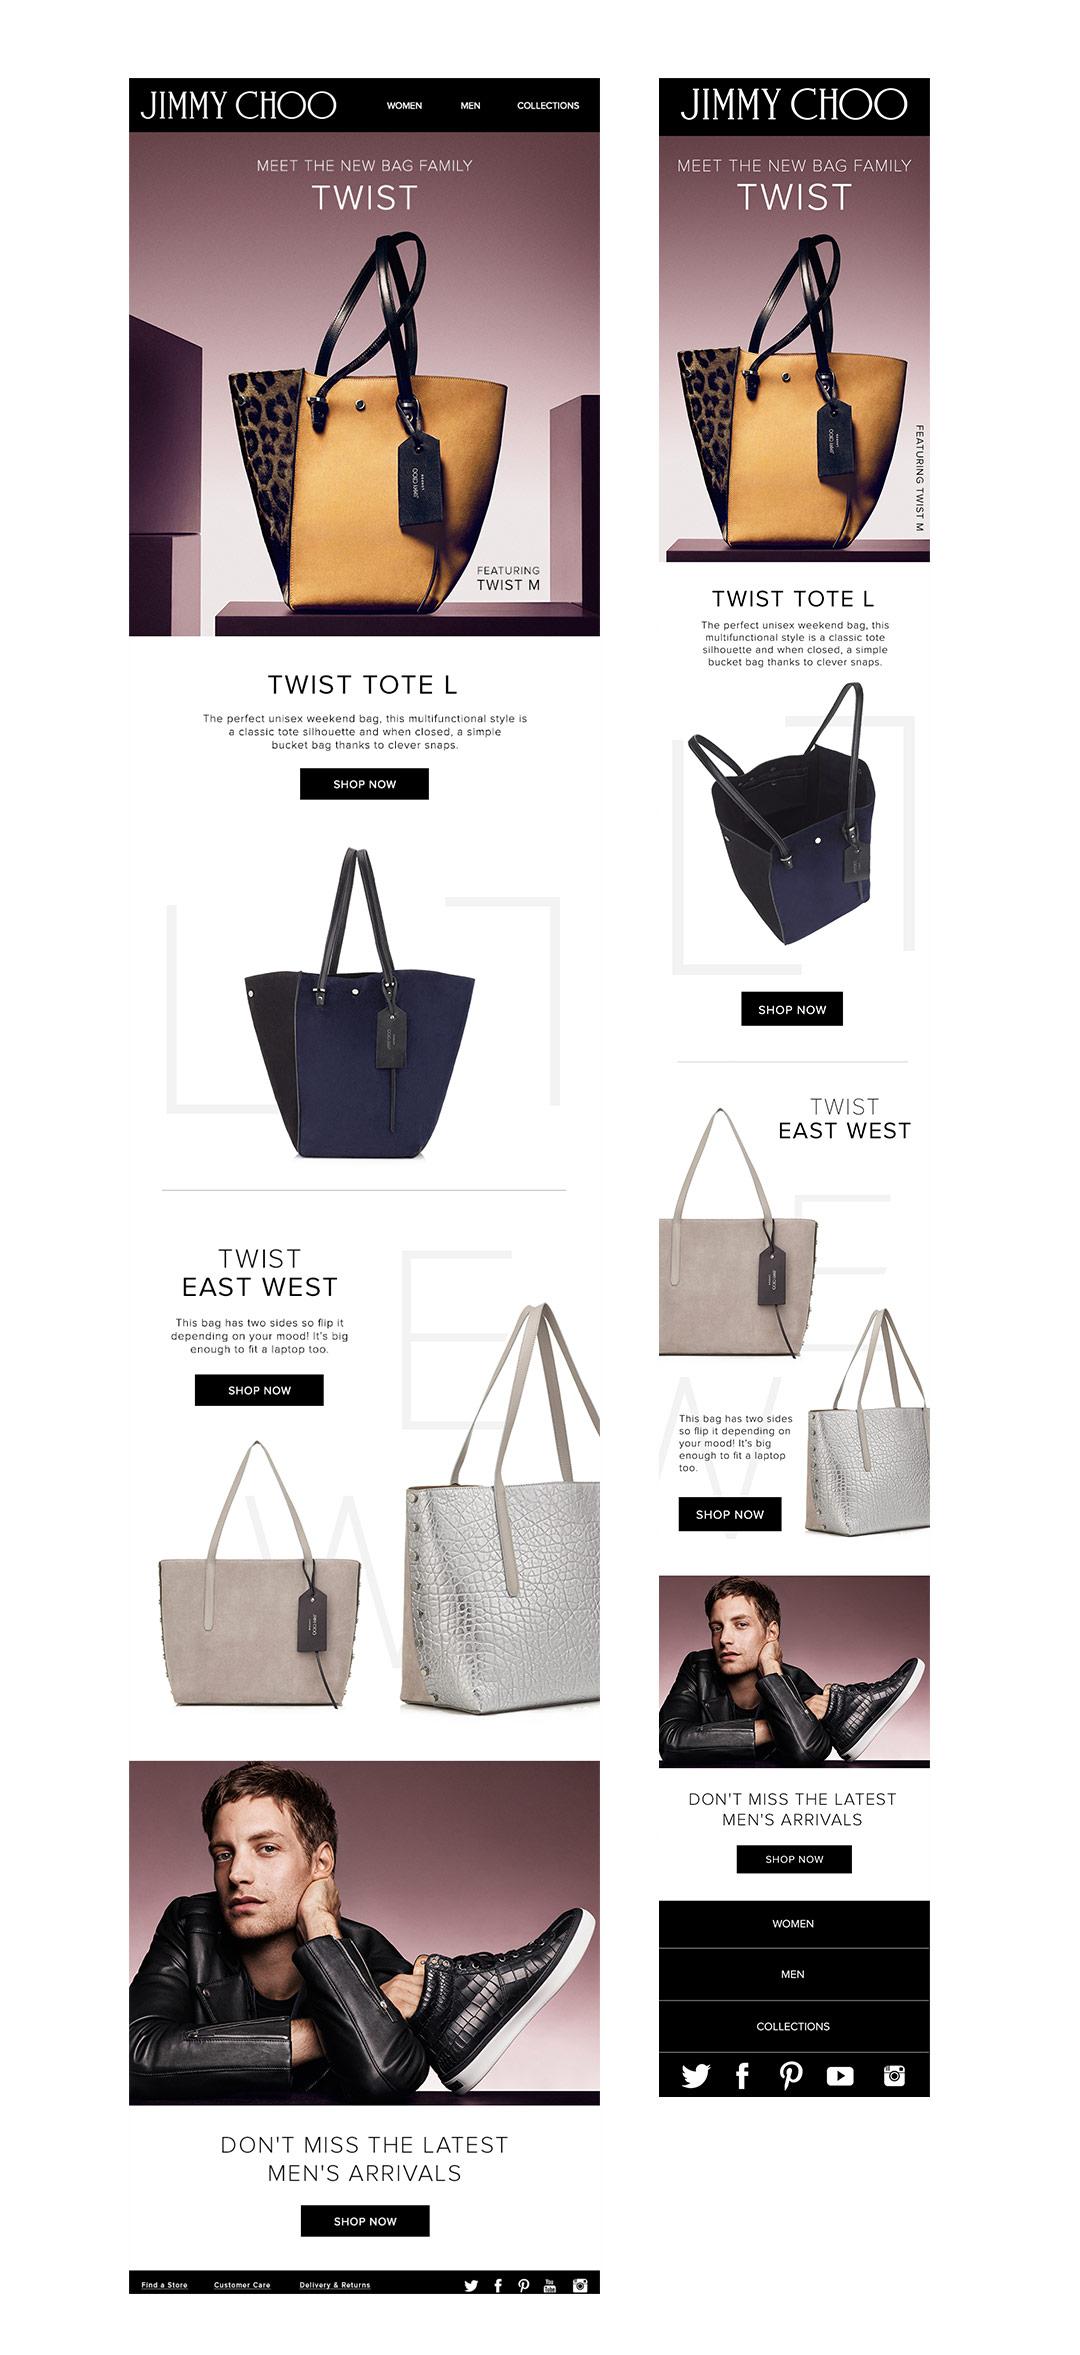 adoreddesigns-editorial-post-jimmy-choo2